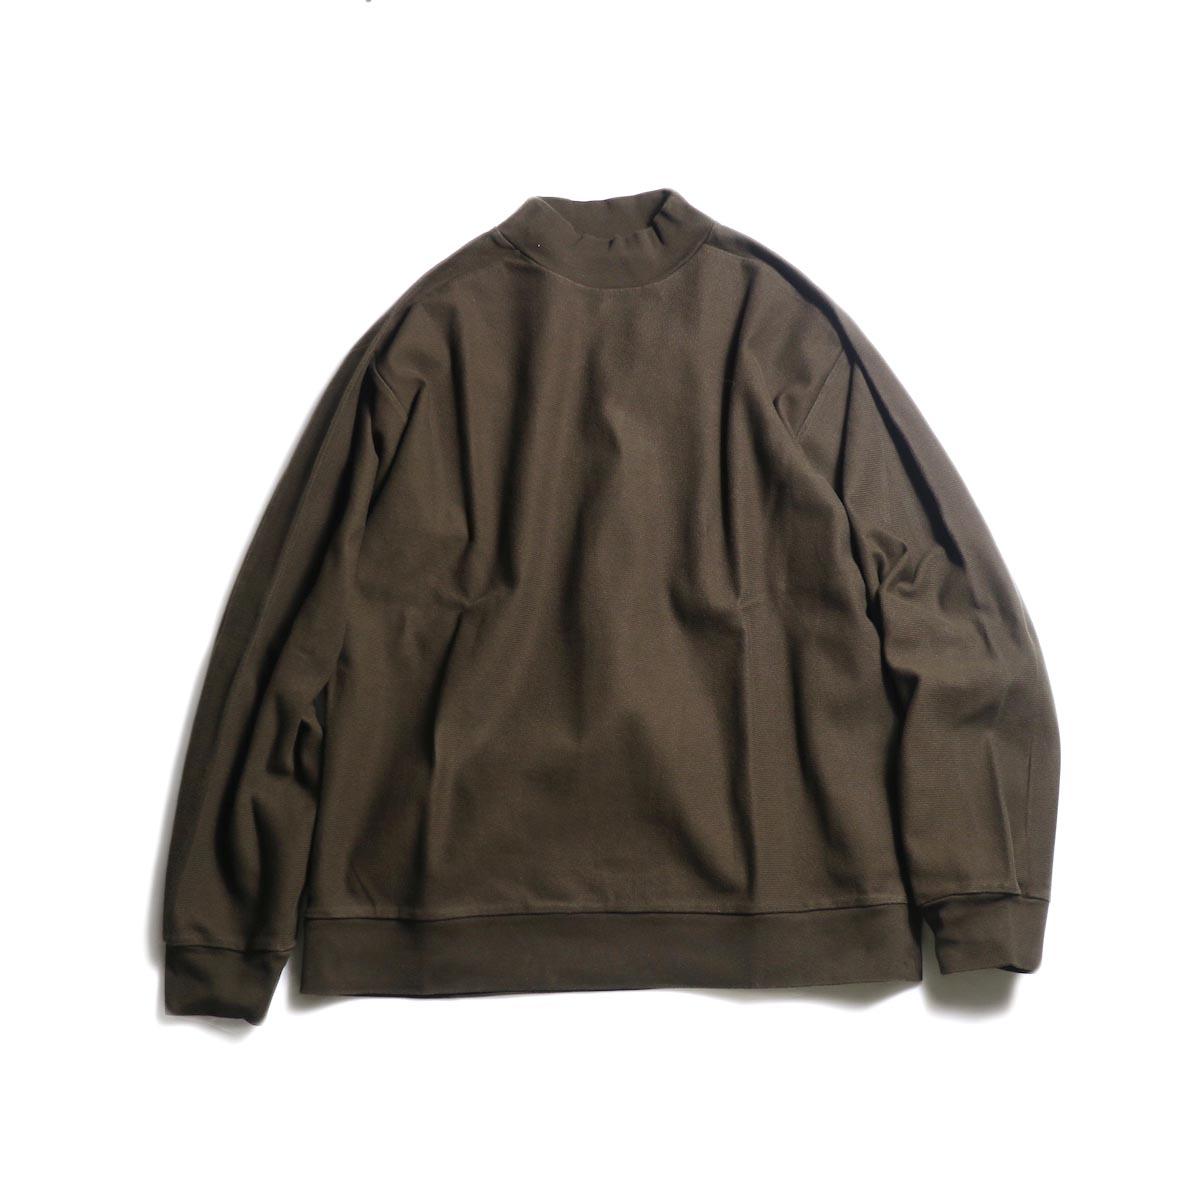 blurhms / Raschel High-Necked P/O (Brown)